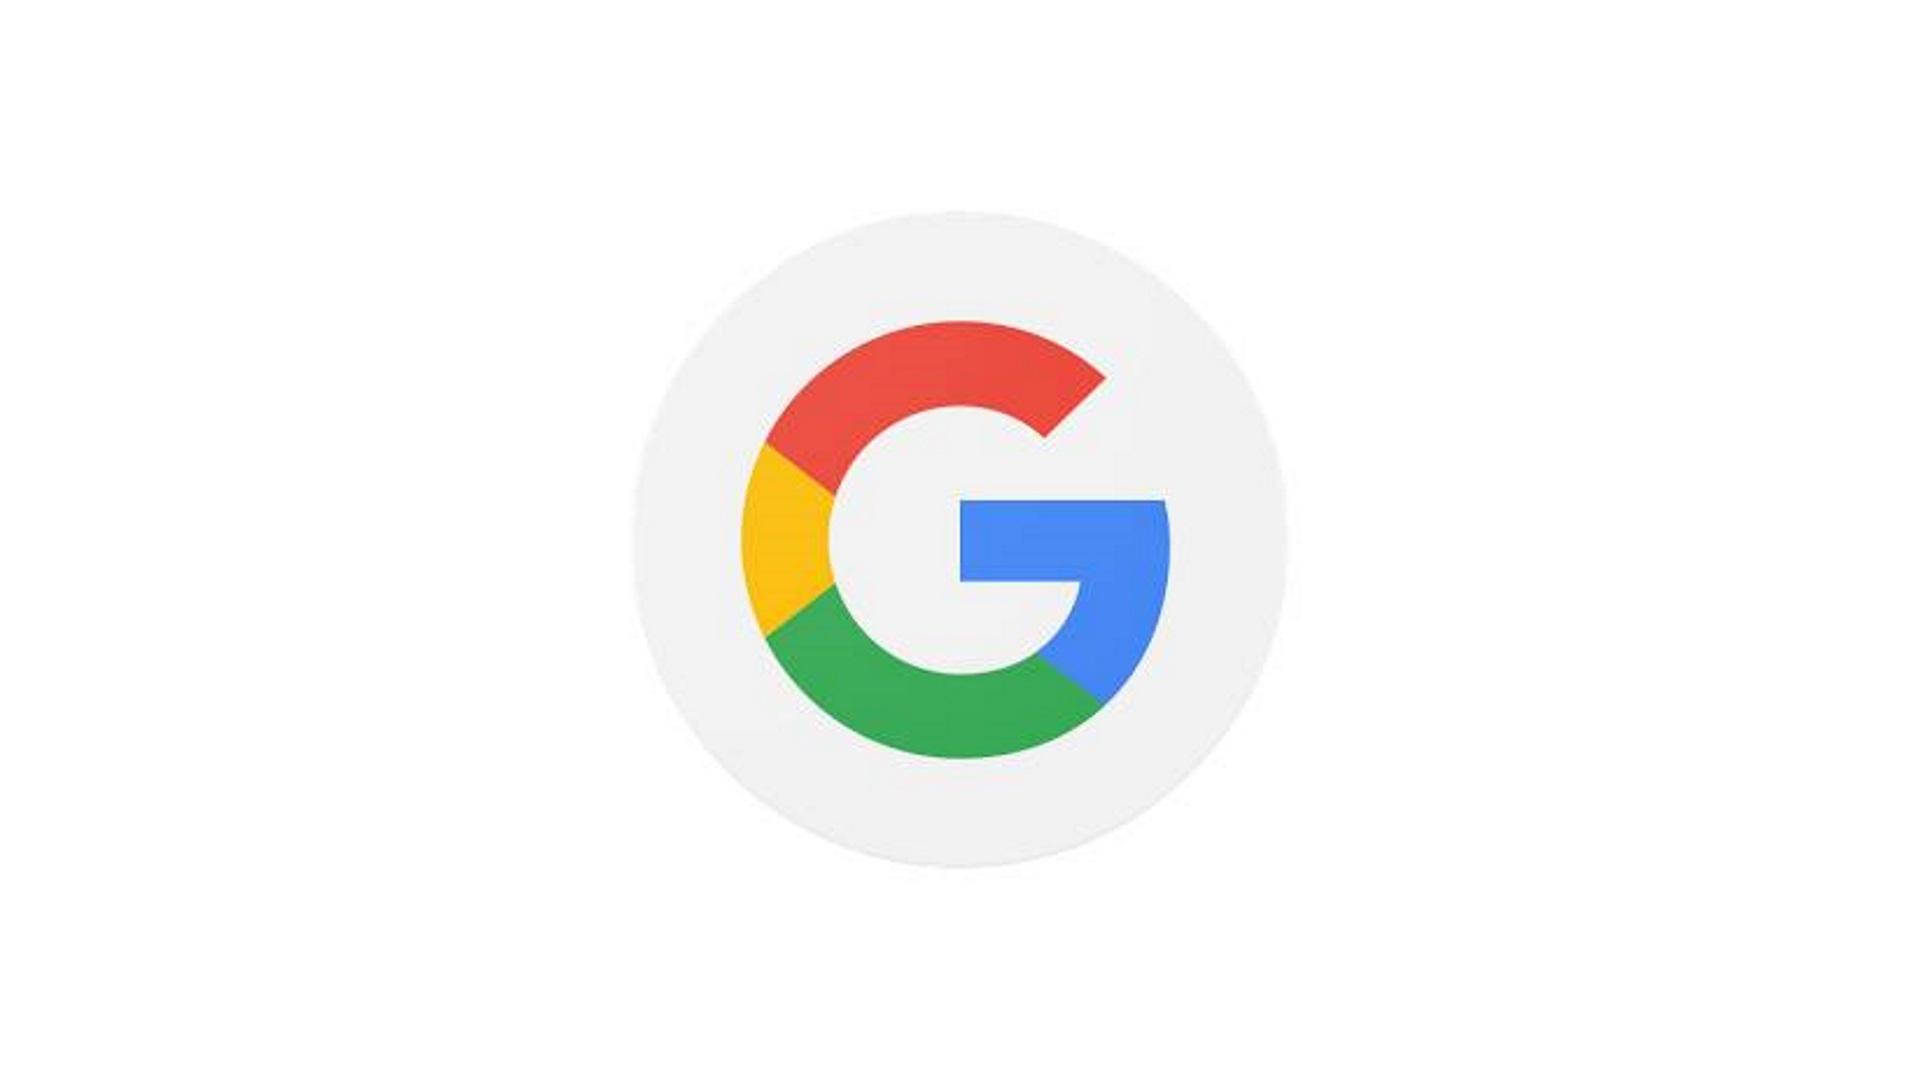 iOS版「Google」アプリのフィードにトピックアイコンの追加を確認【レポート】